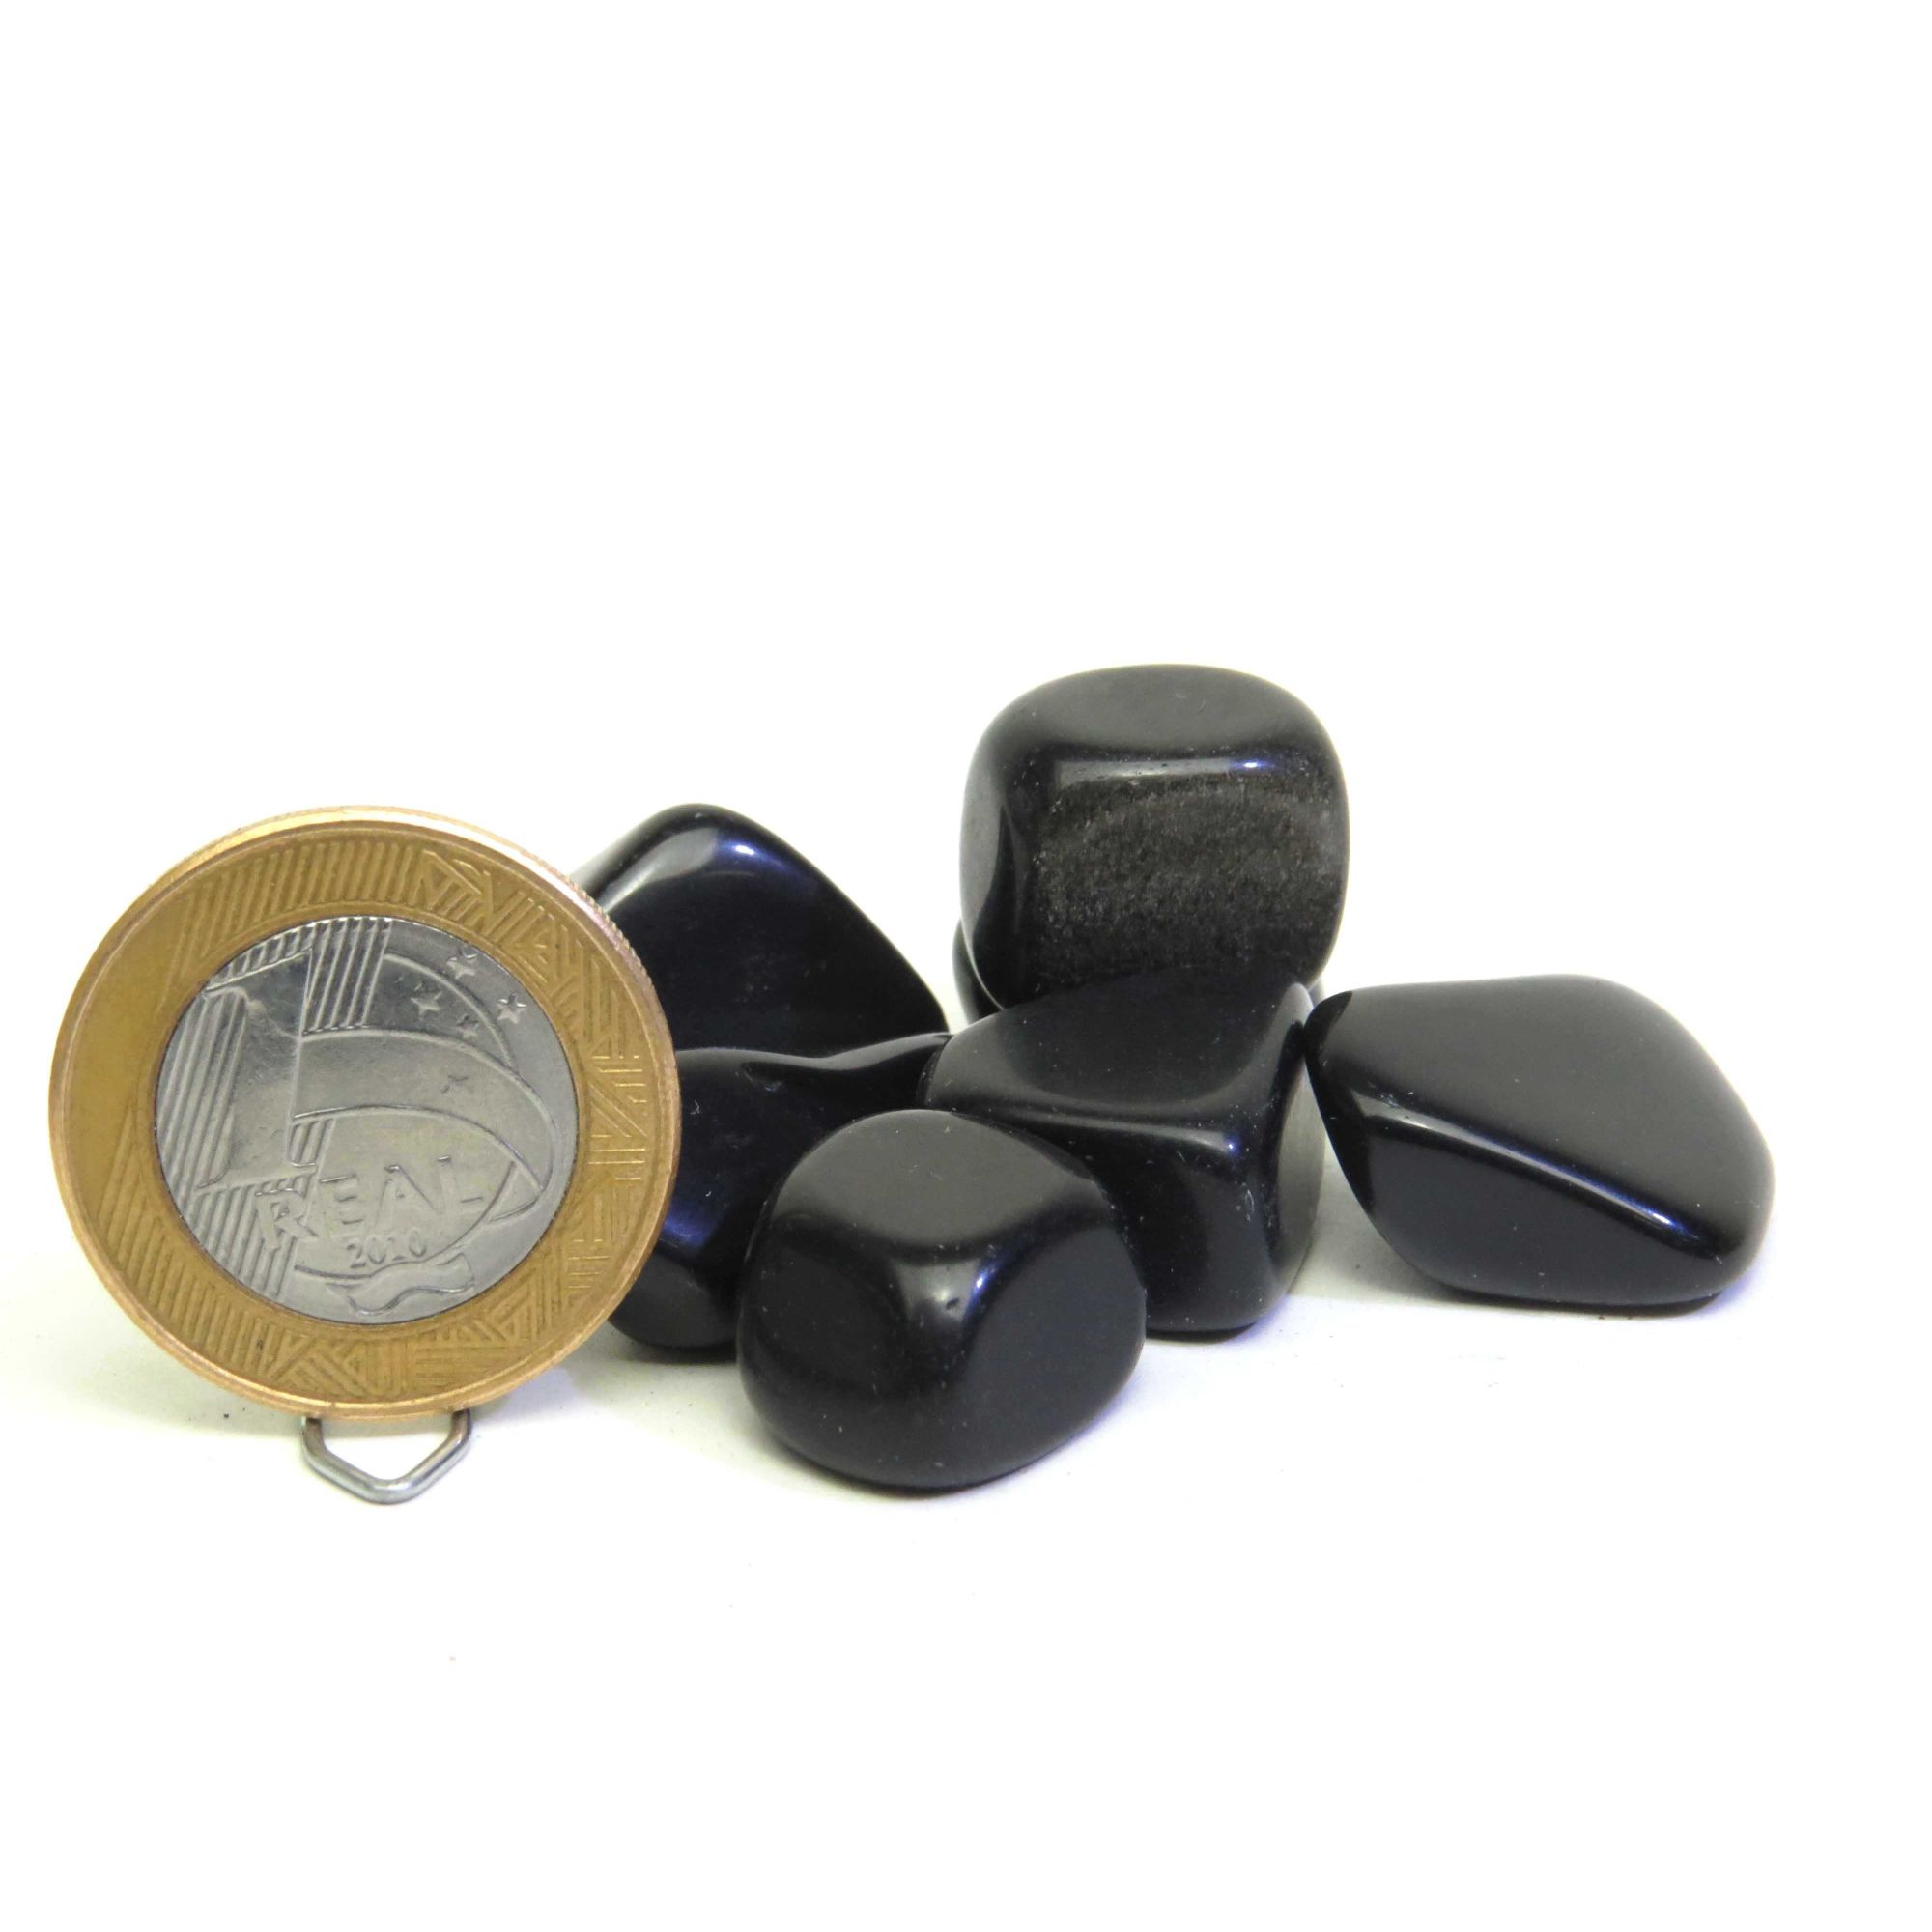 Obsidiana - Rolado | R30 - 3 a 4 cm